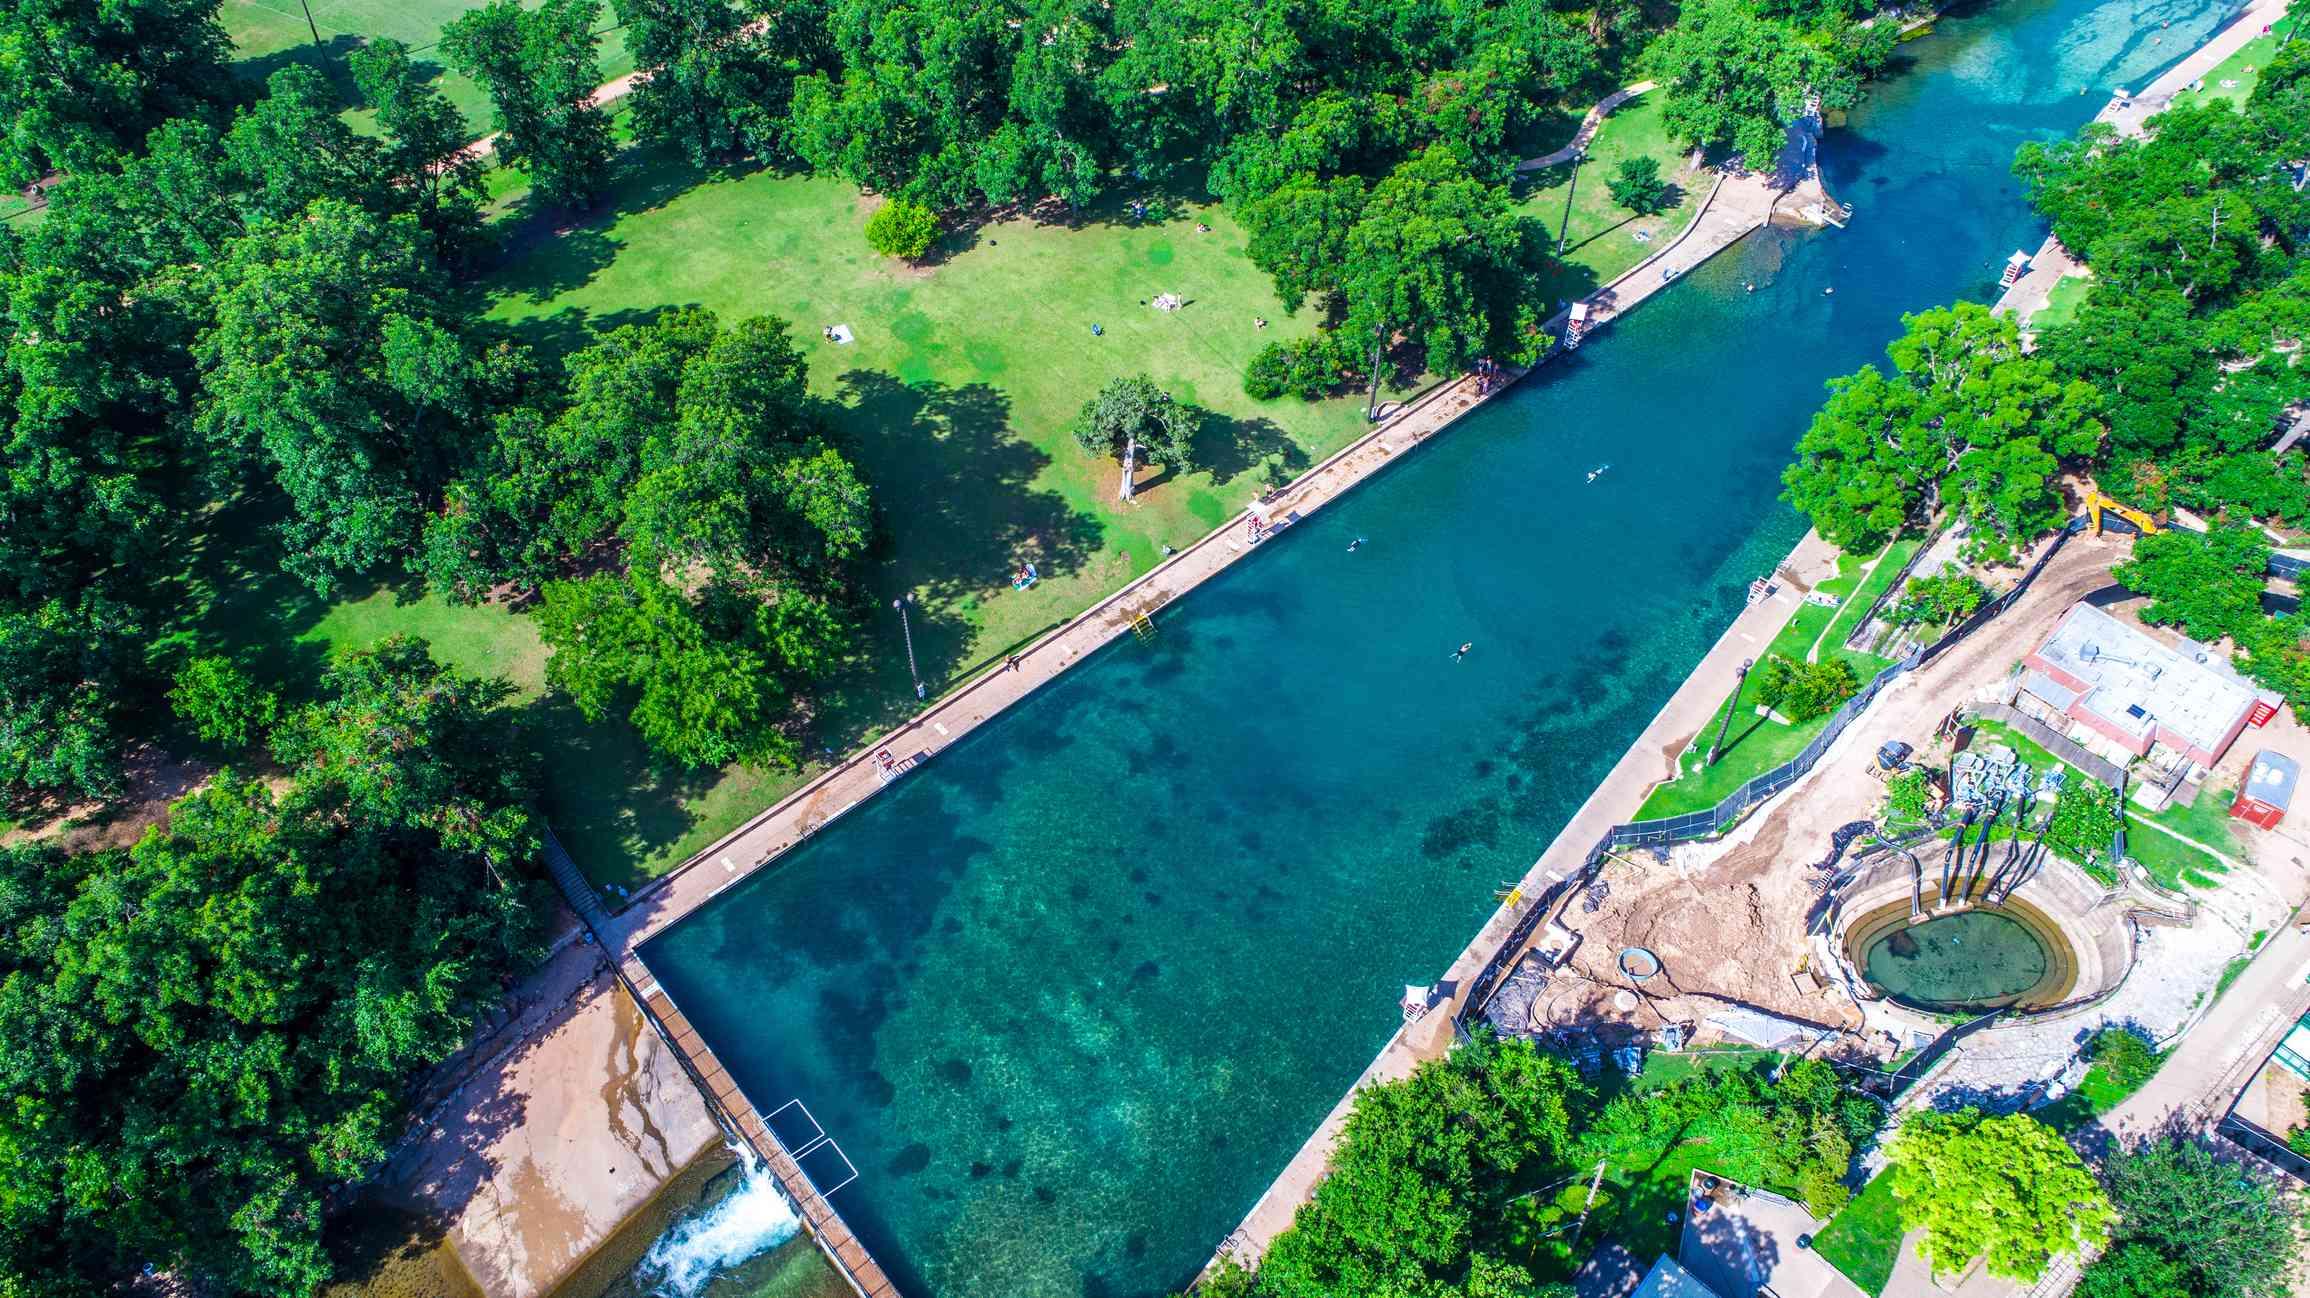 Barton Springs Swimming Hole in Austin, Texas